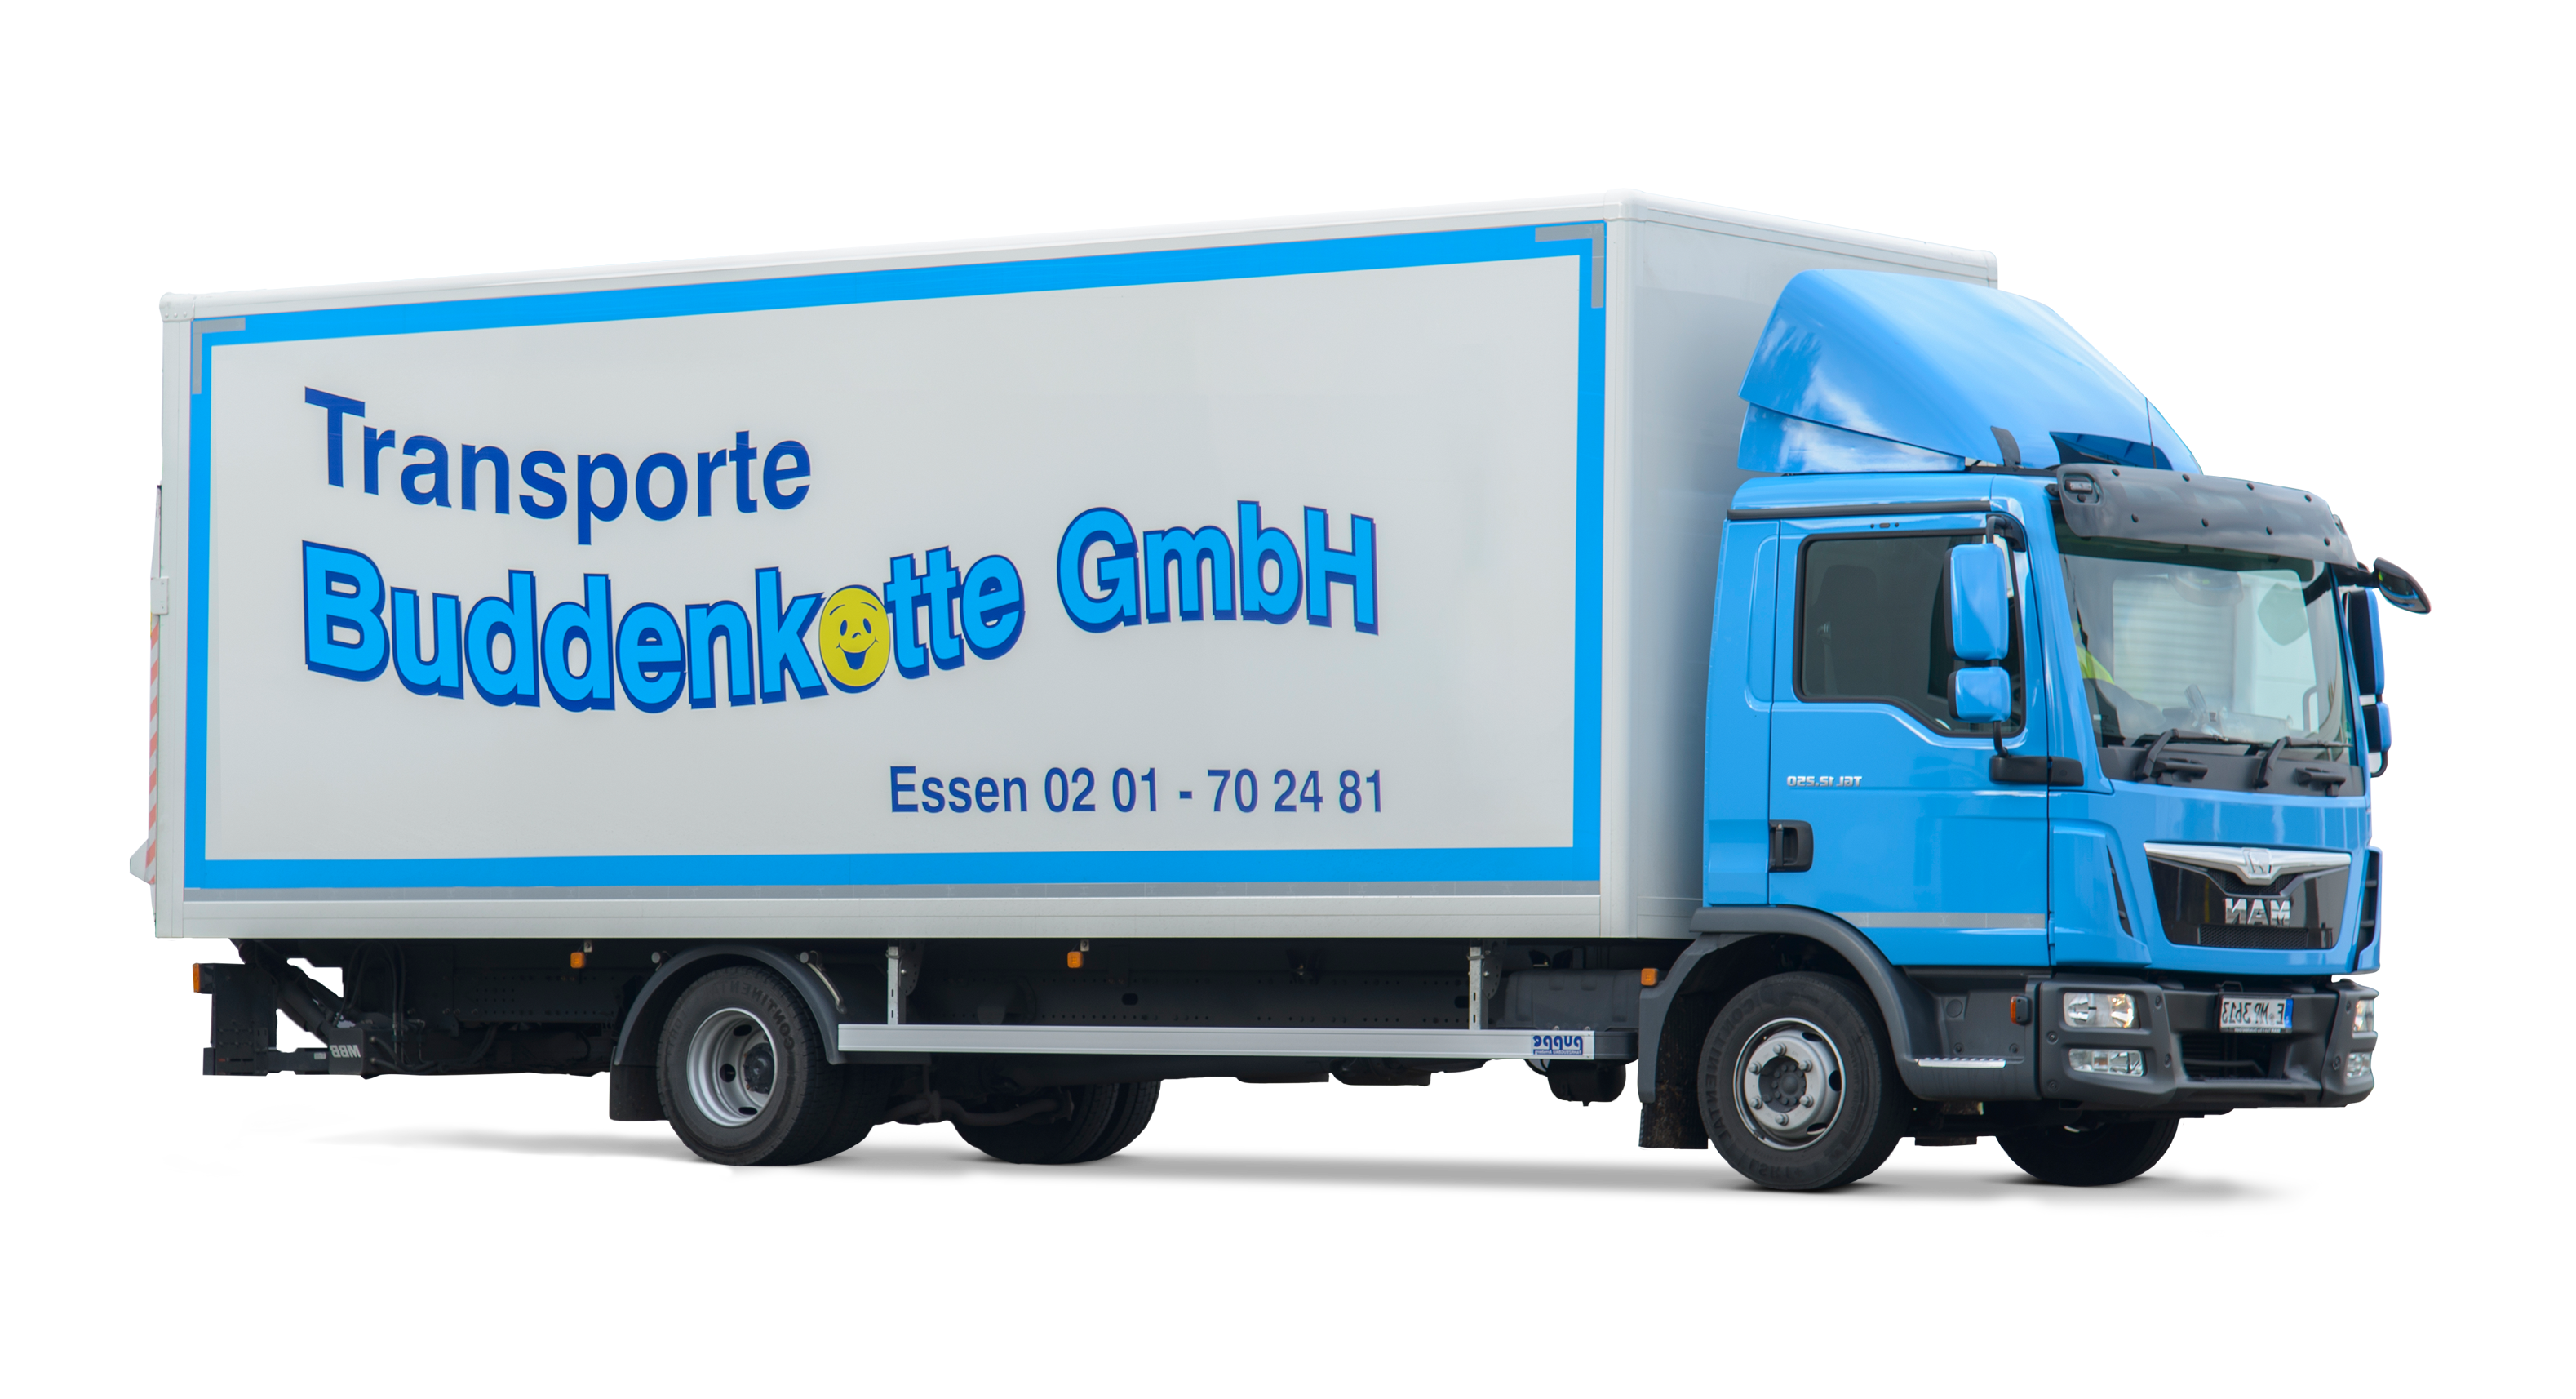 MAN Transporte Buddenkotte GmbH